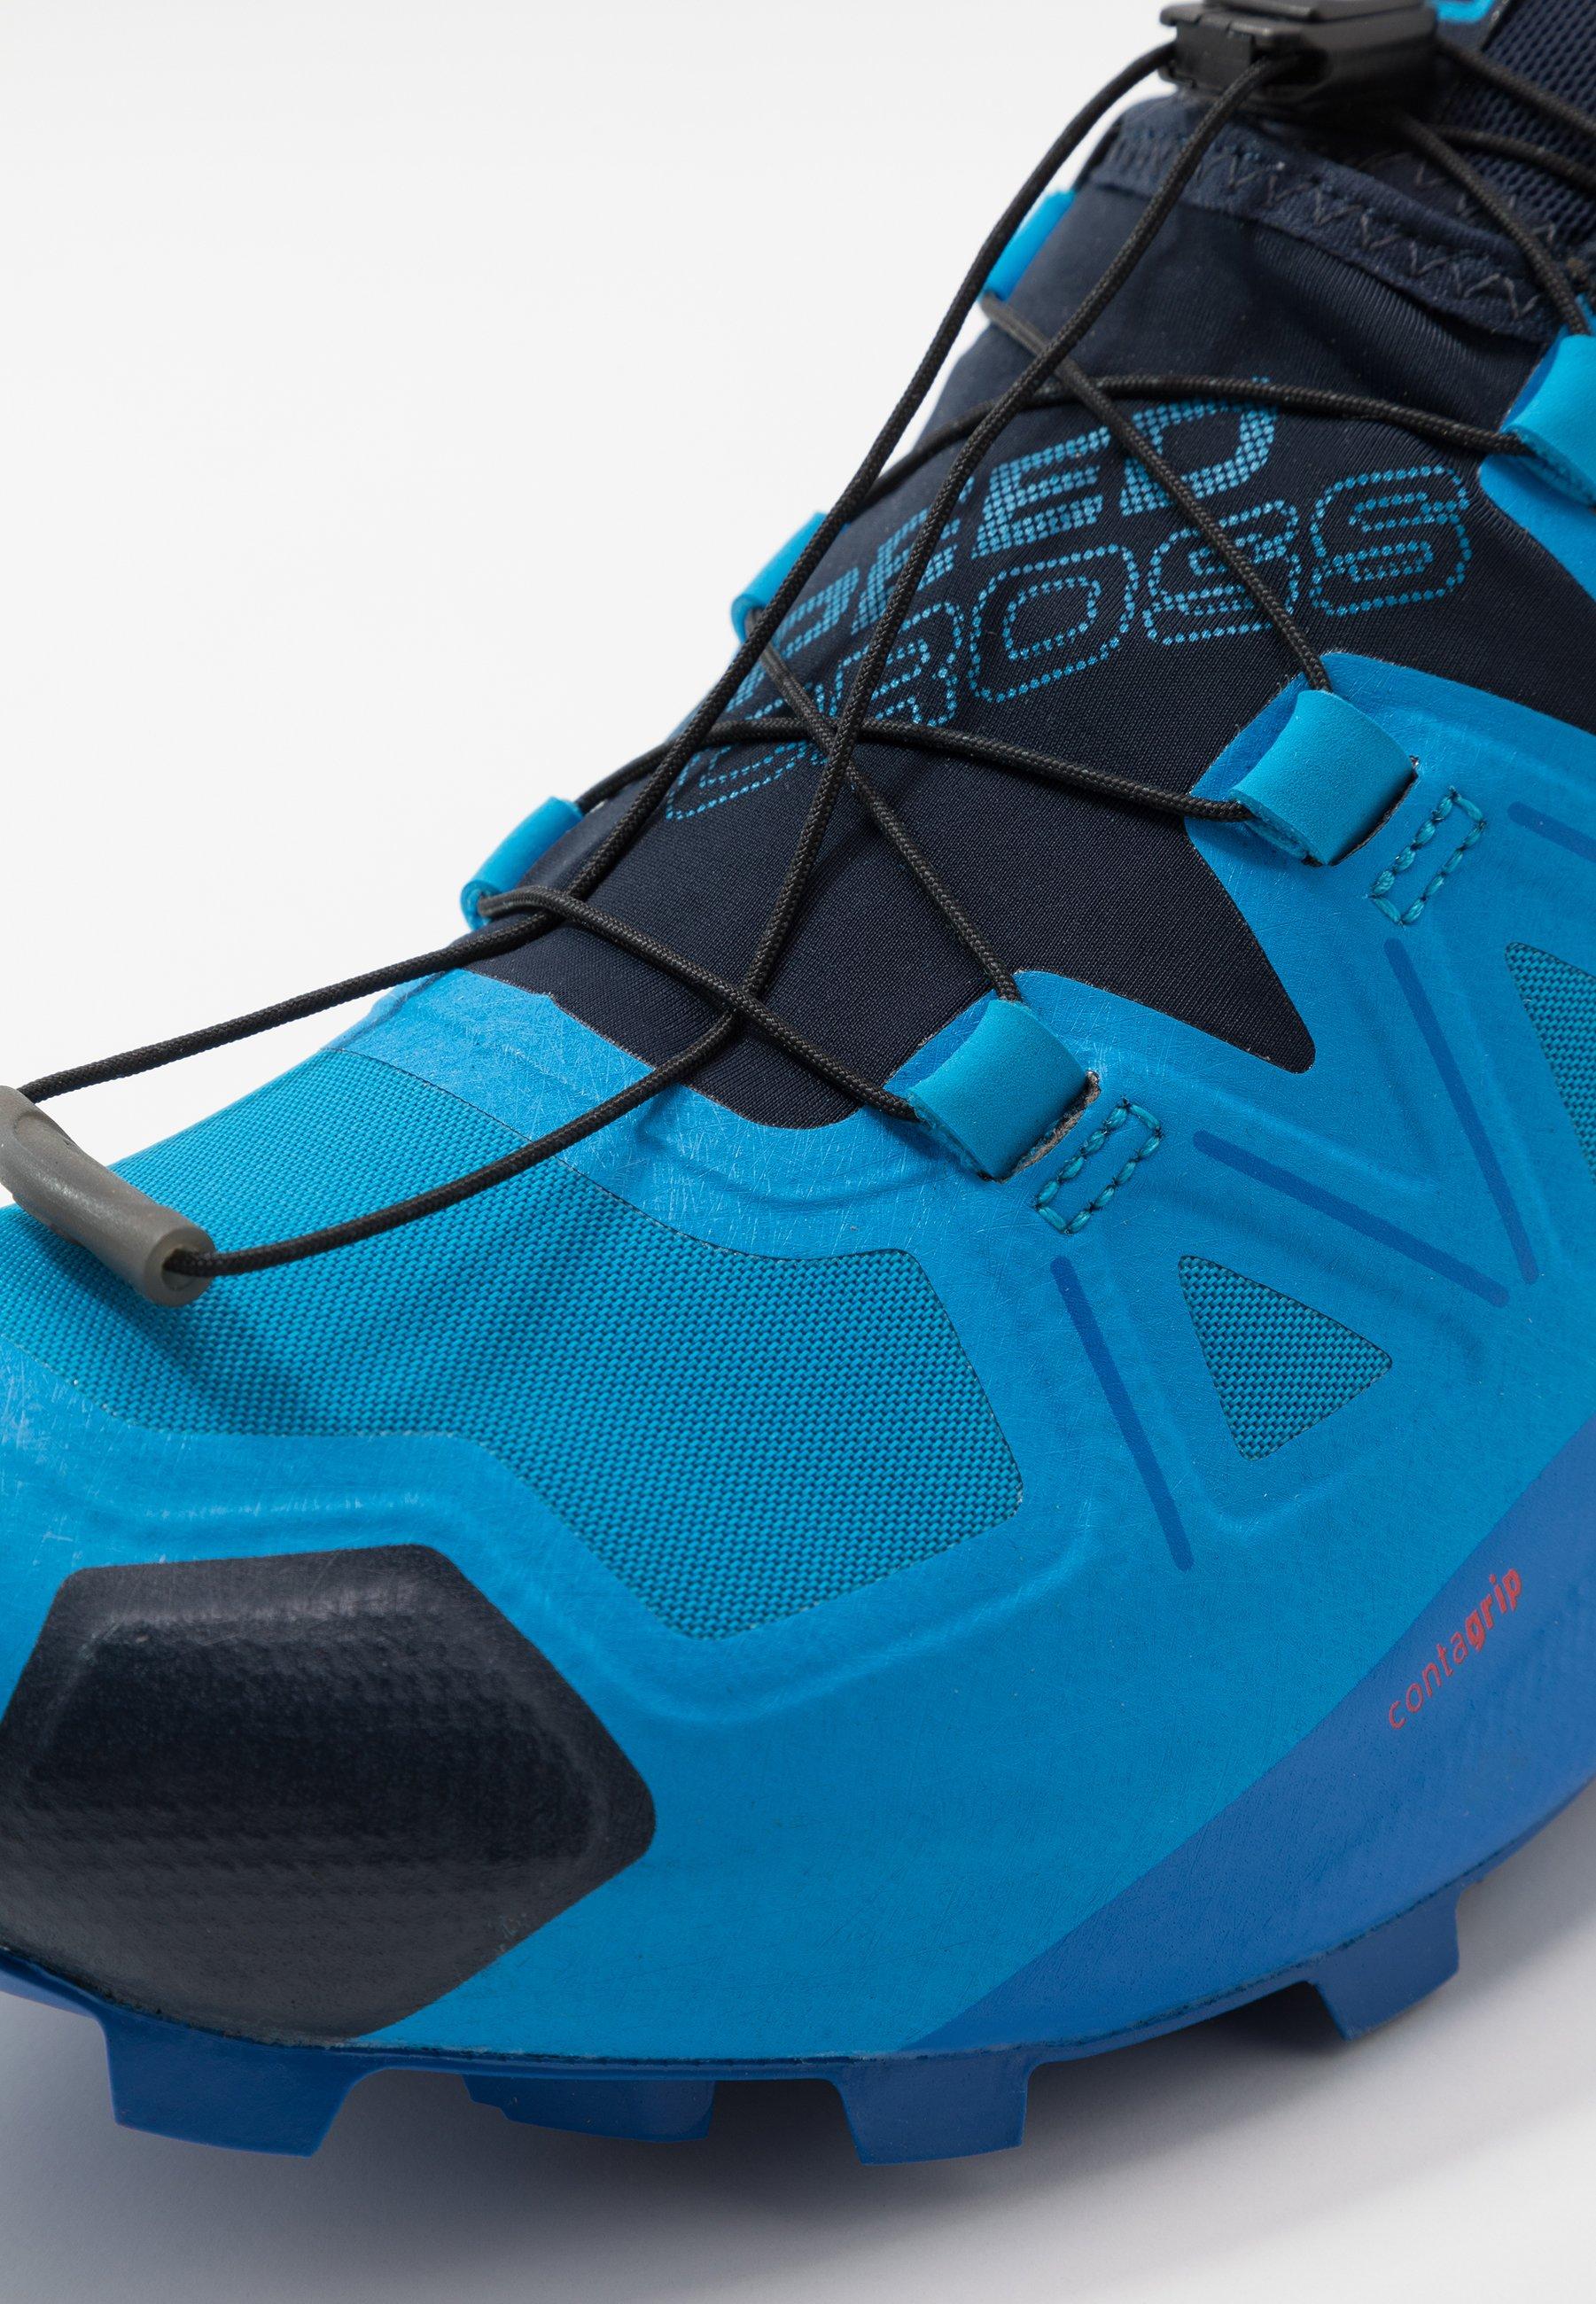 Salomon Speedcross 5 Gtx - Löparskor Terräng Blue Aster/lapis Blue/navy Blazer